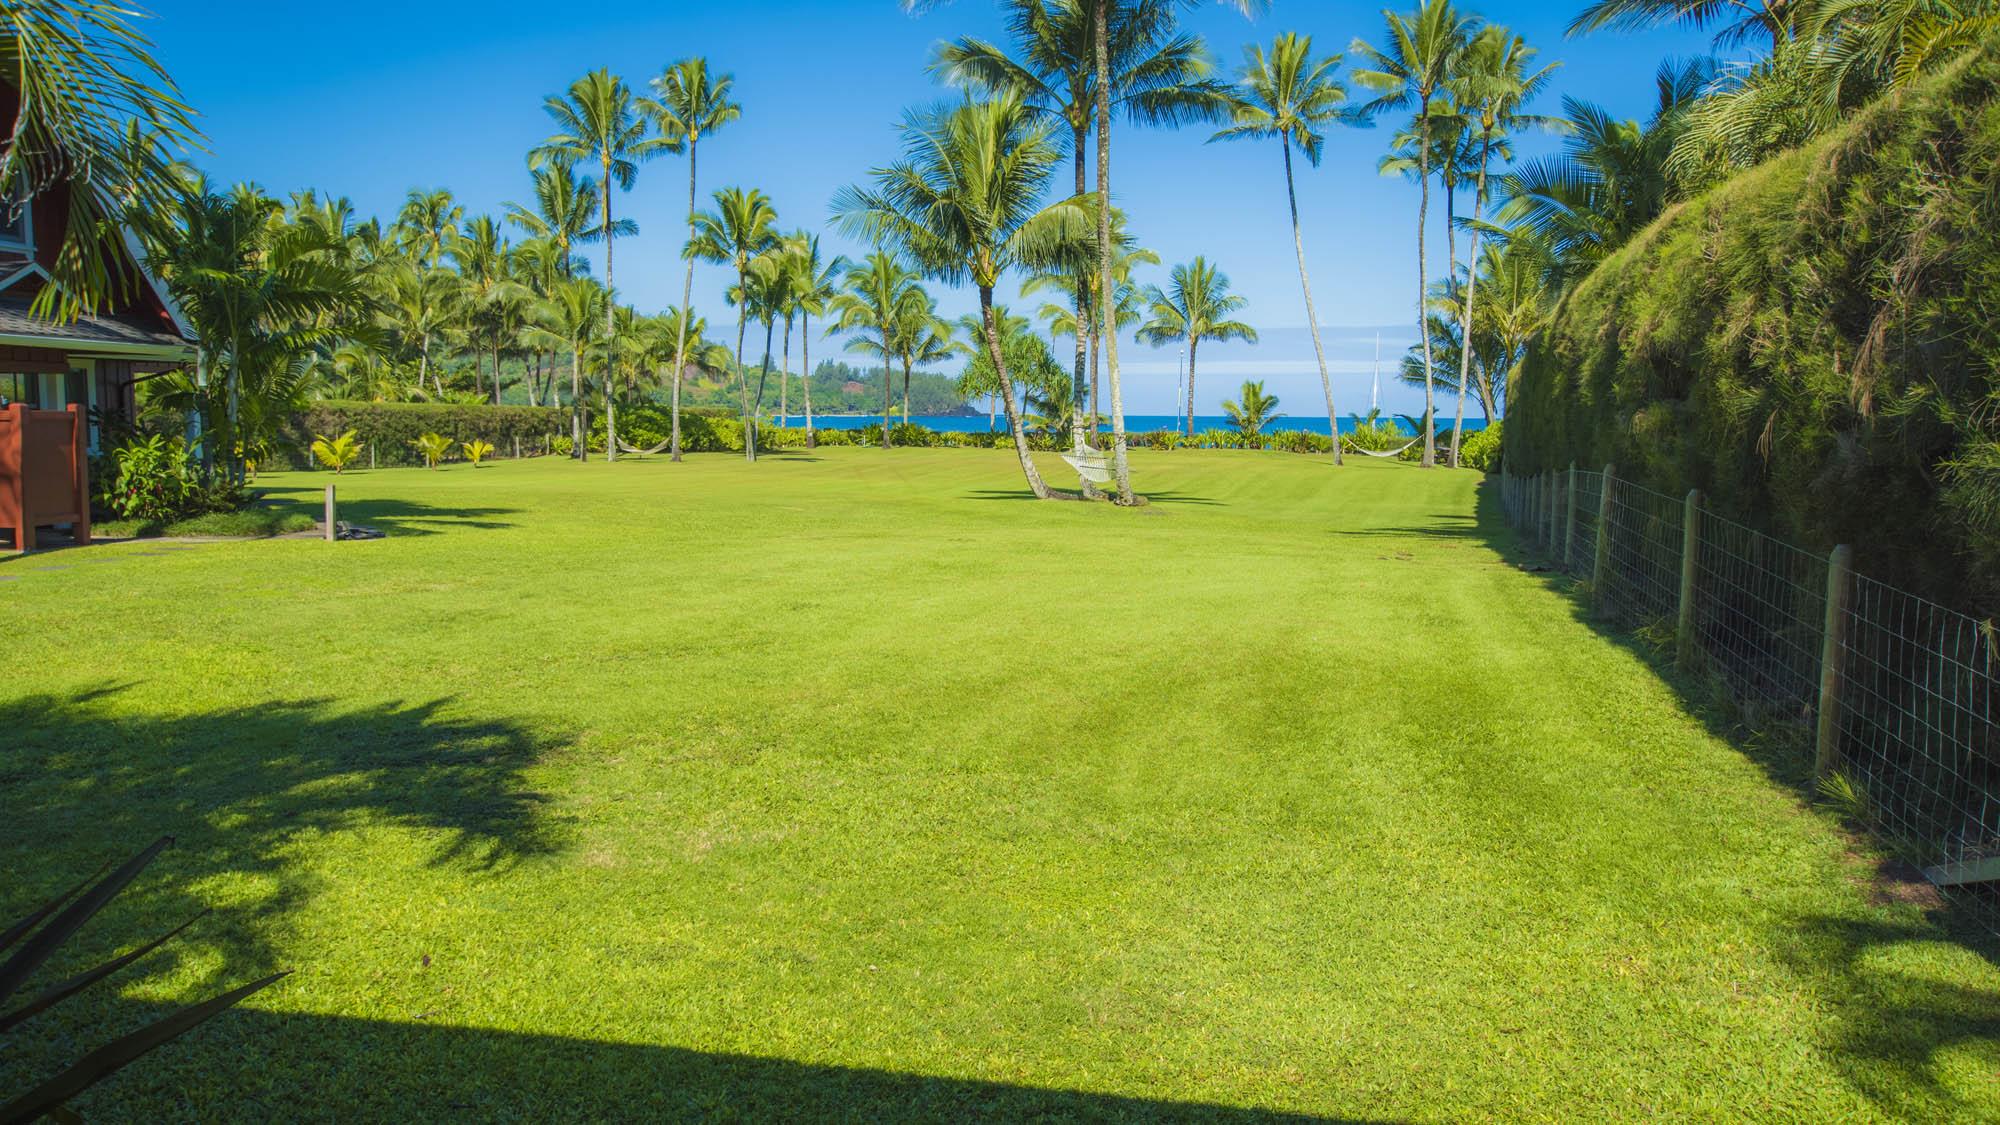 Kauai-217-Hanalei Bay26